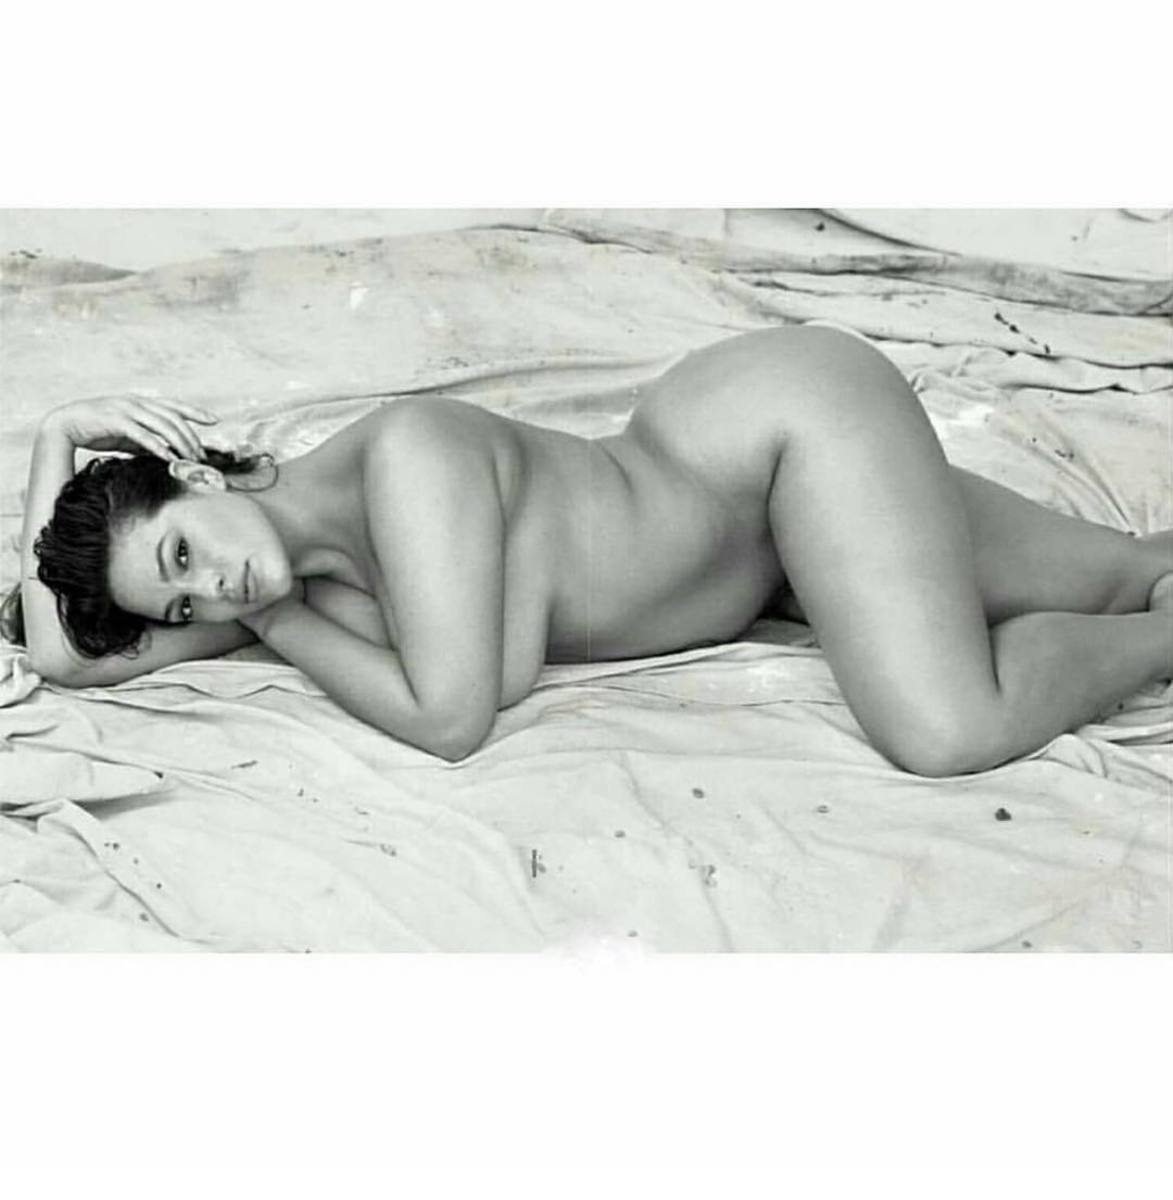 ashley-graham-instagram11.jpg